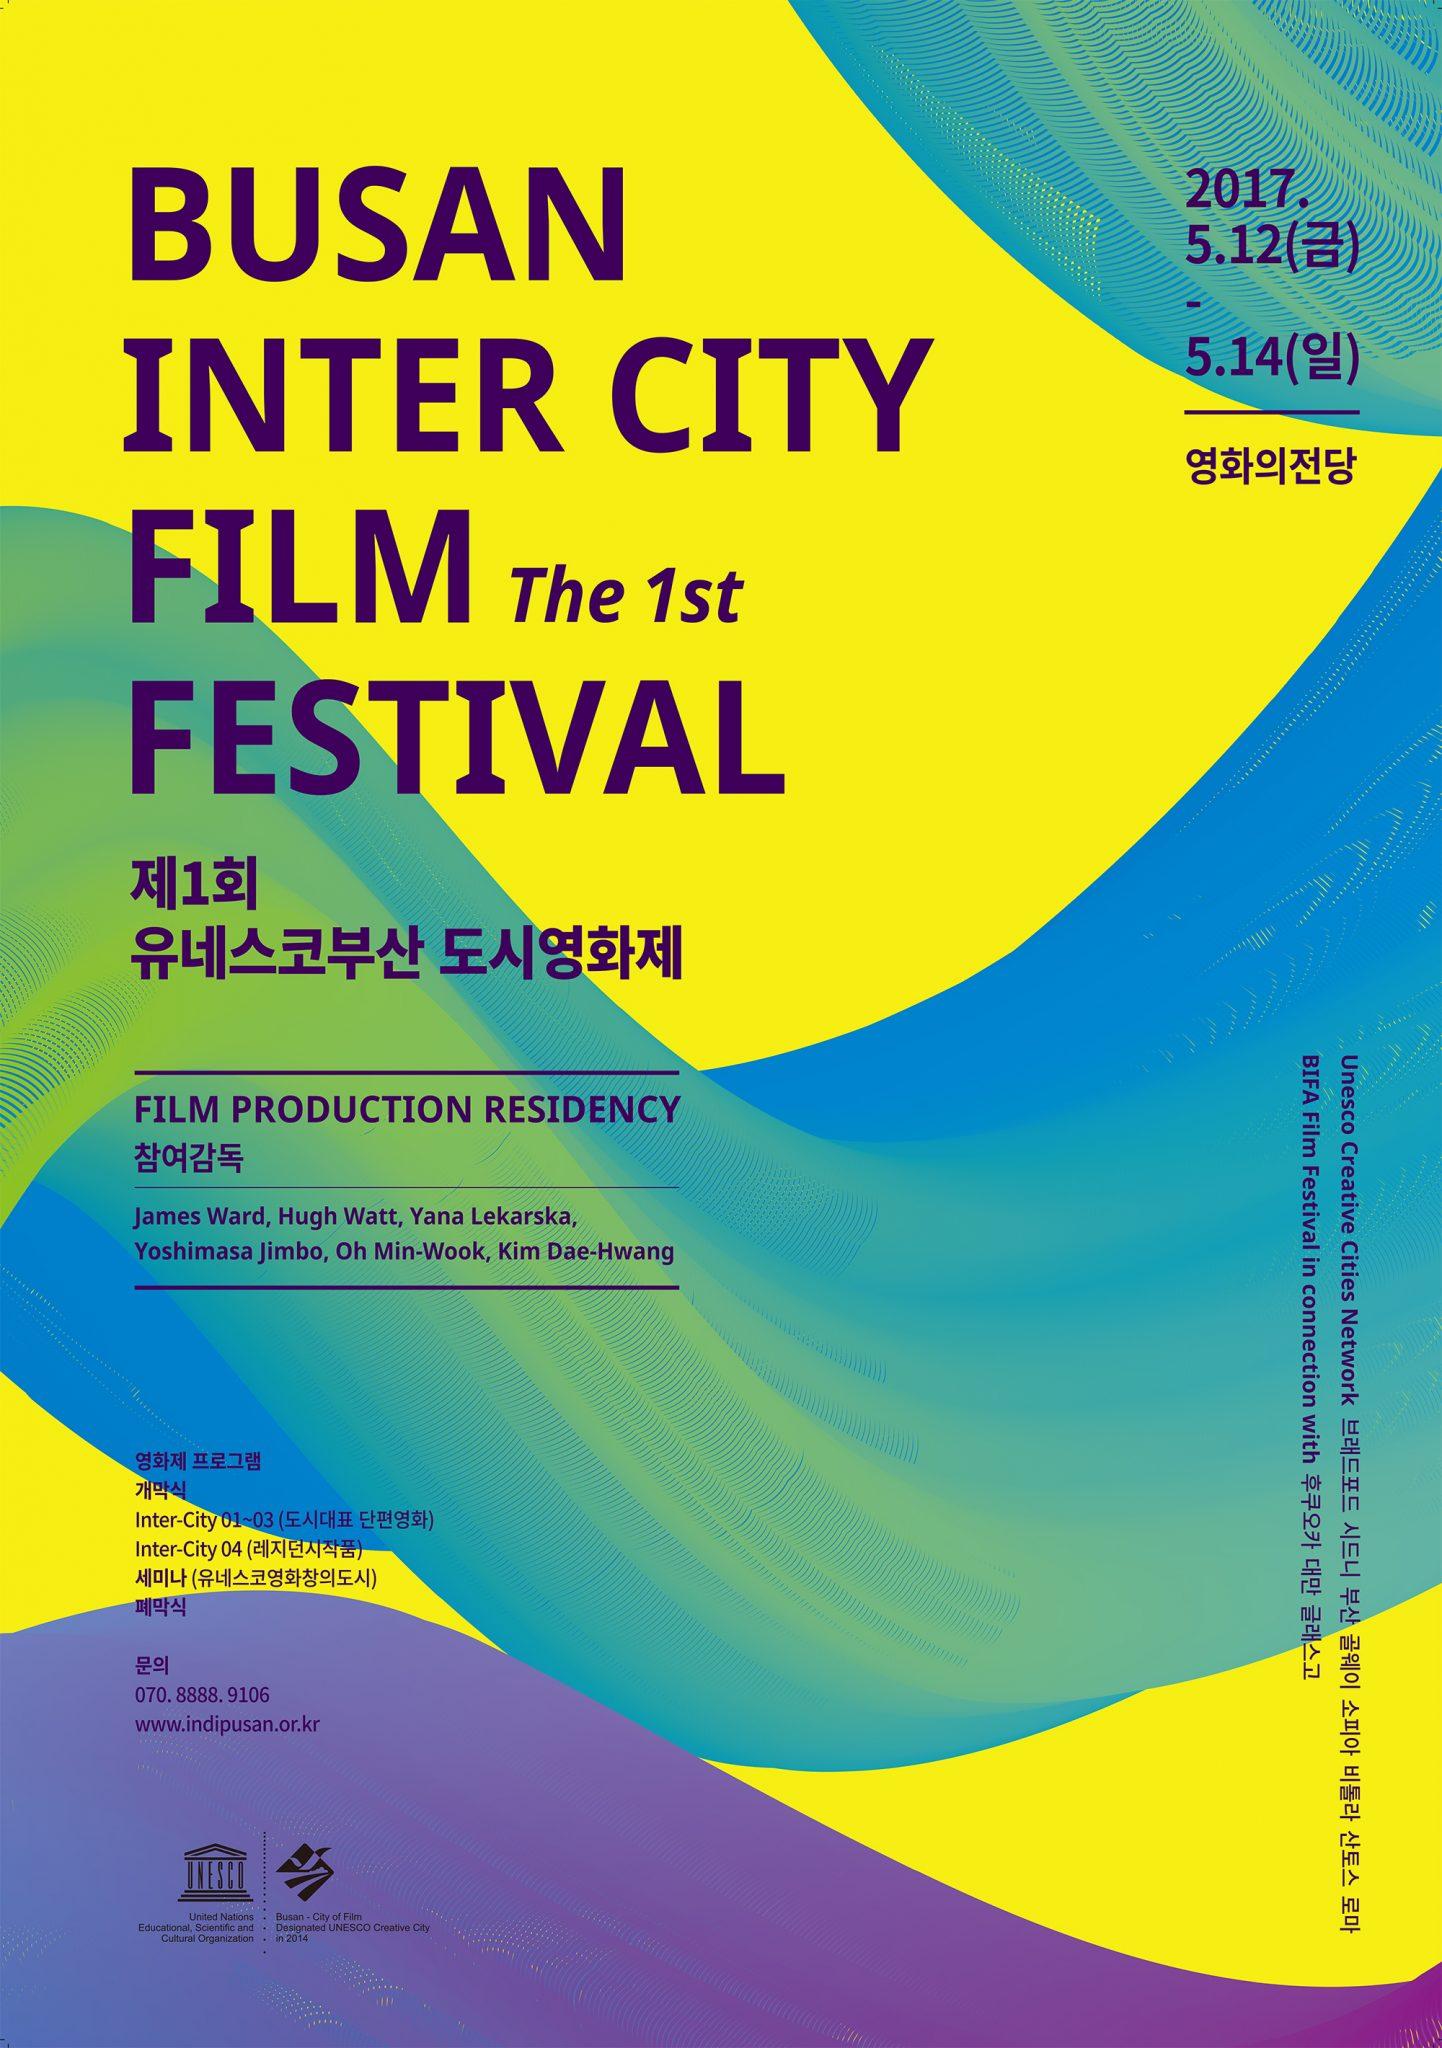 Busan Inter City Film Festival